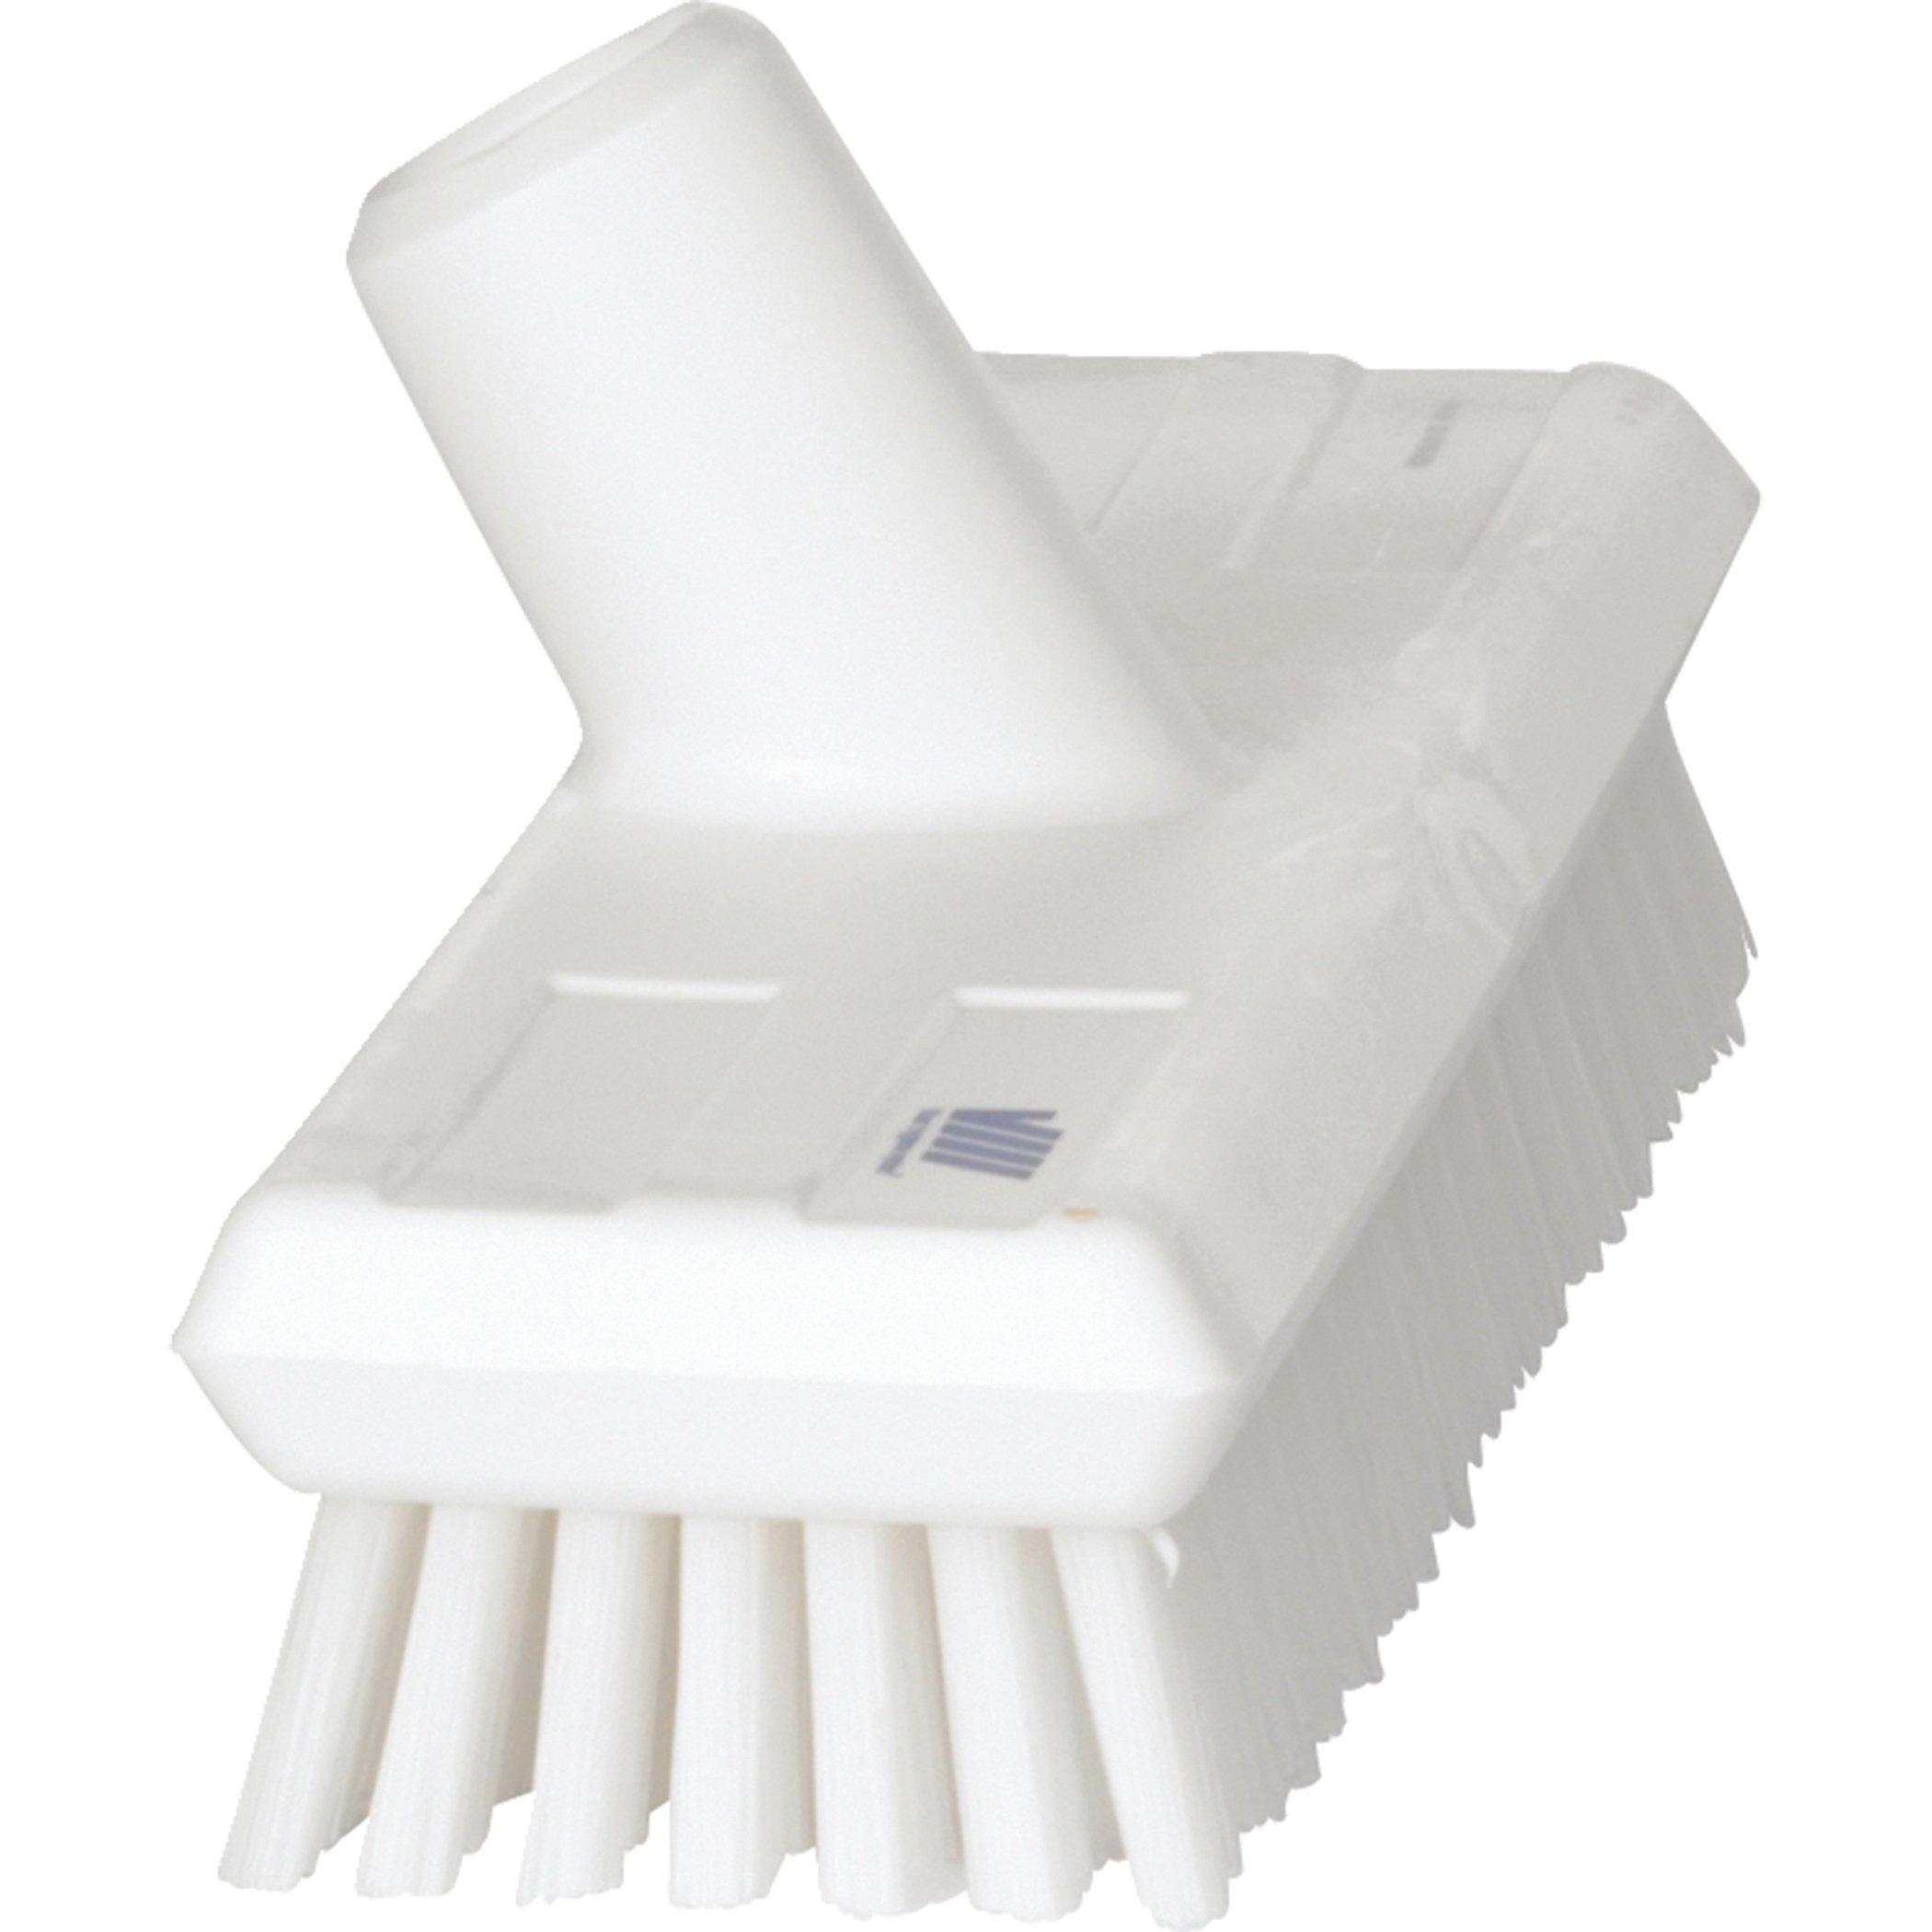 Deck Scrub Brush, 10-3/4''L, Stiff